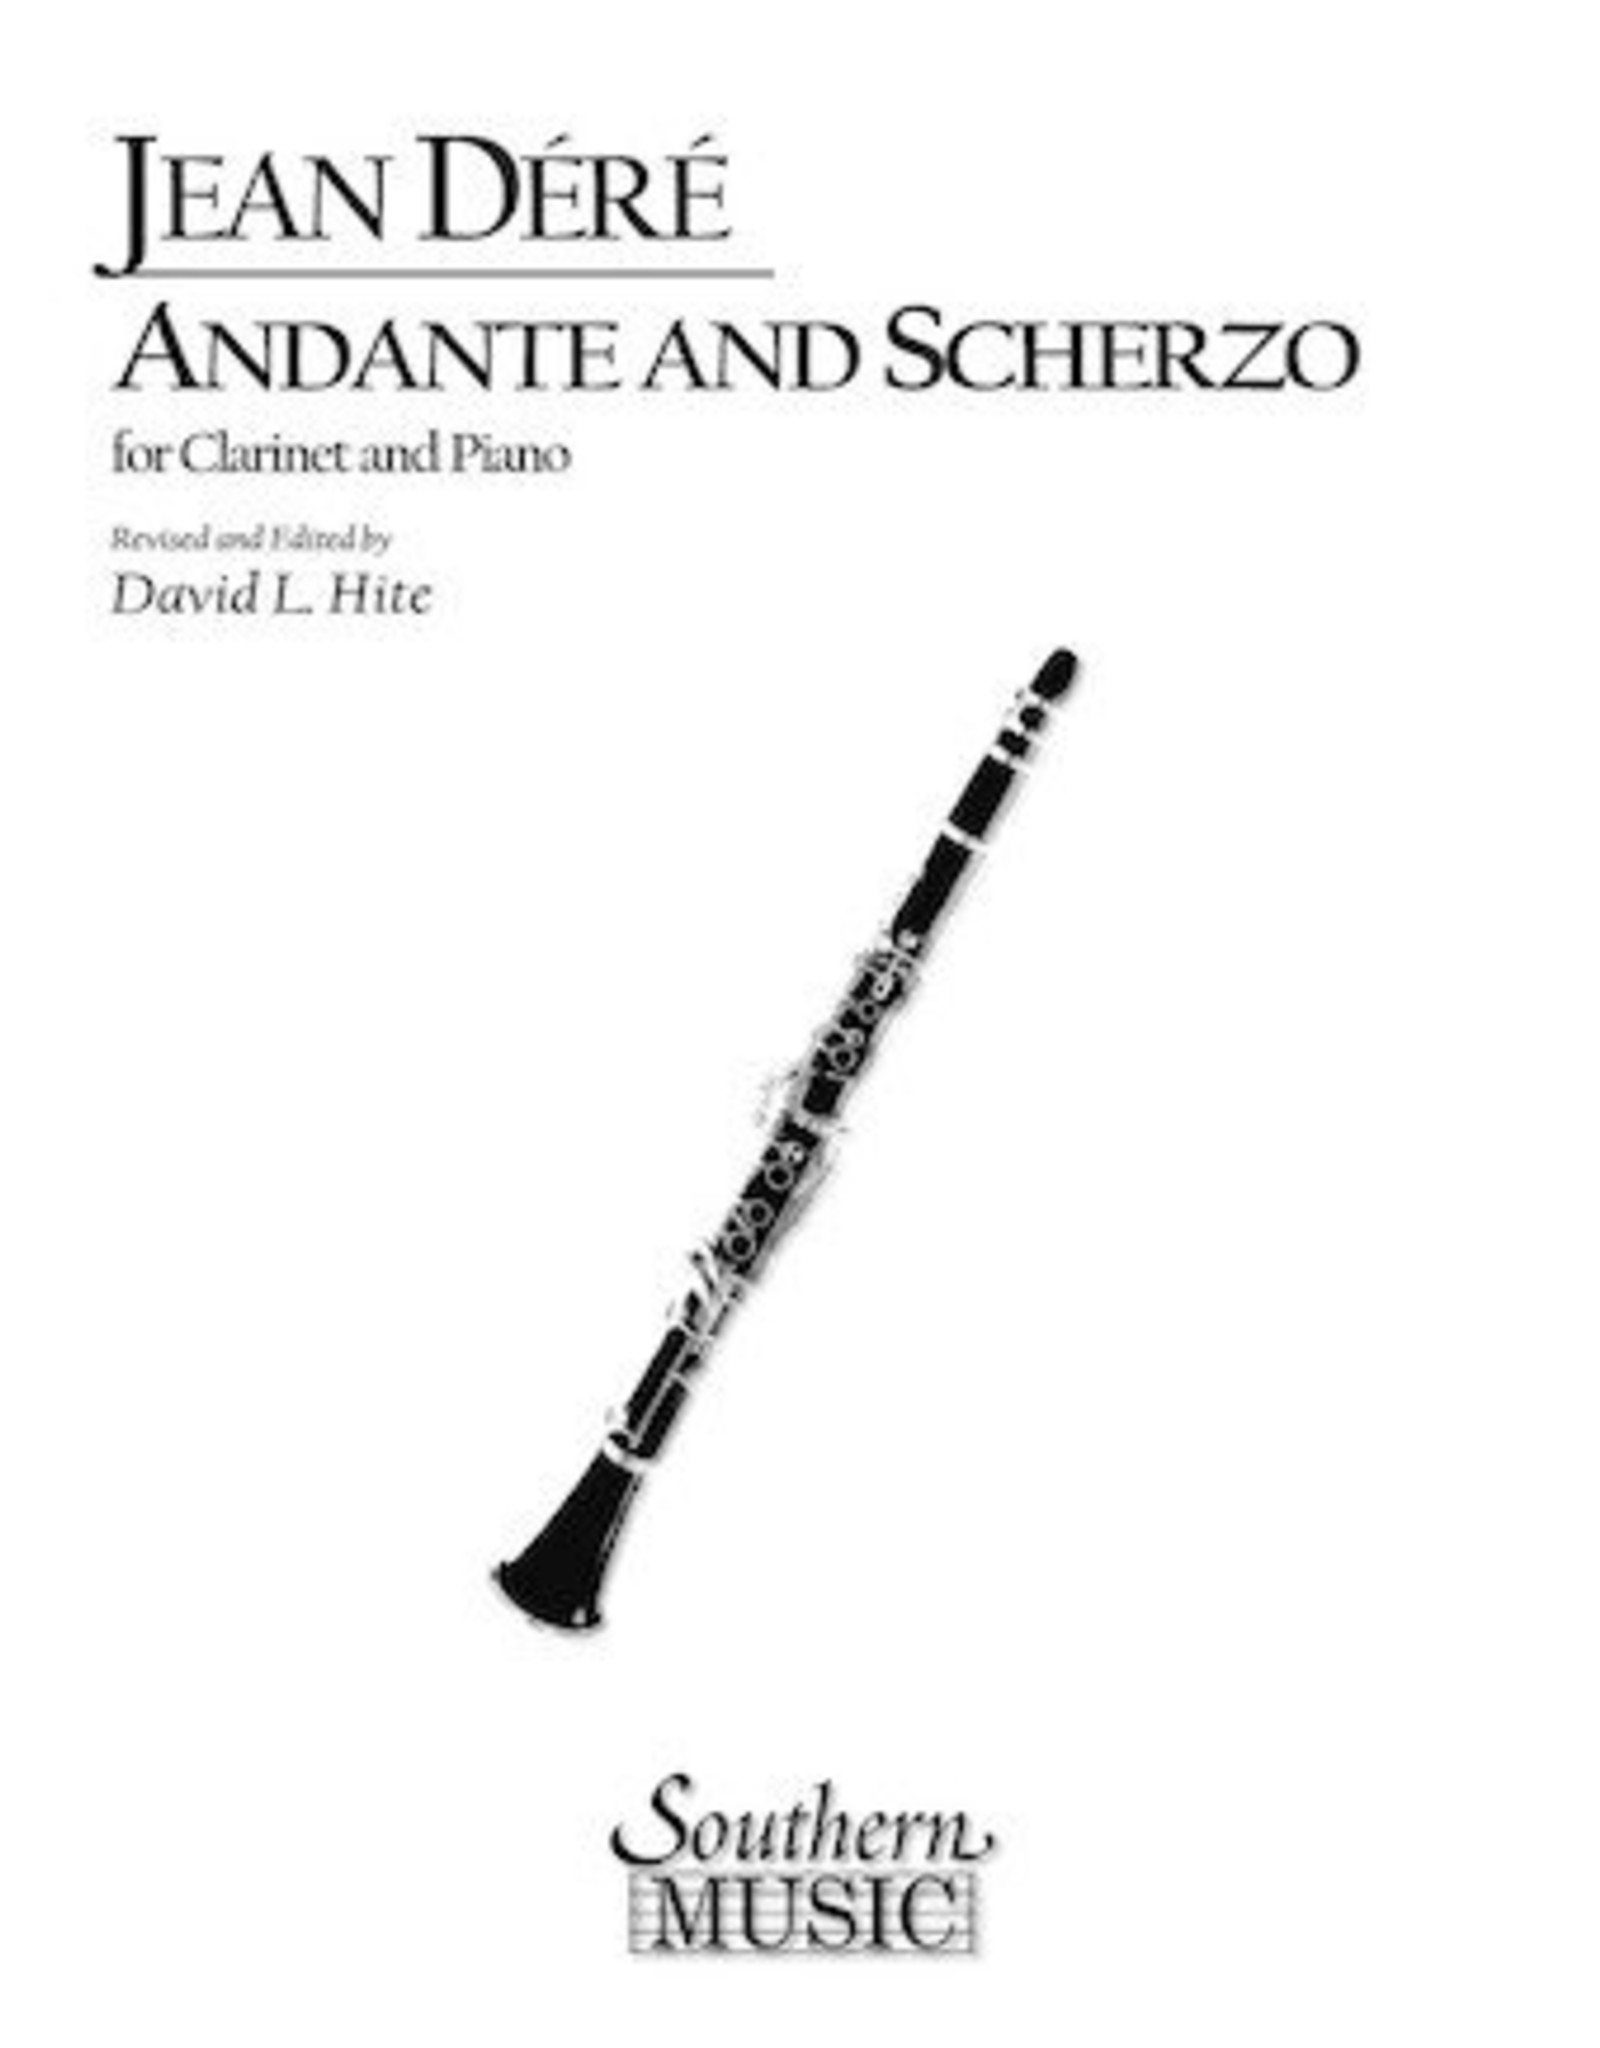 Hal Leonard Andante and Scherzo Clarinet Southern Music